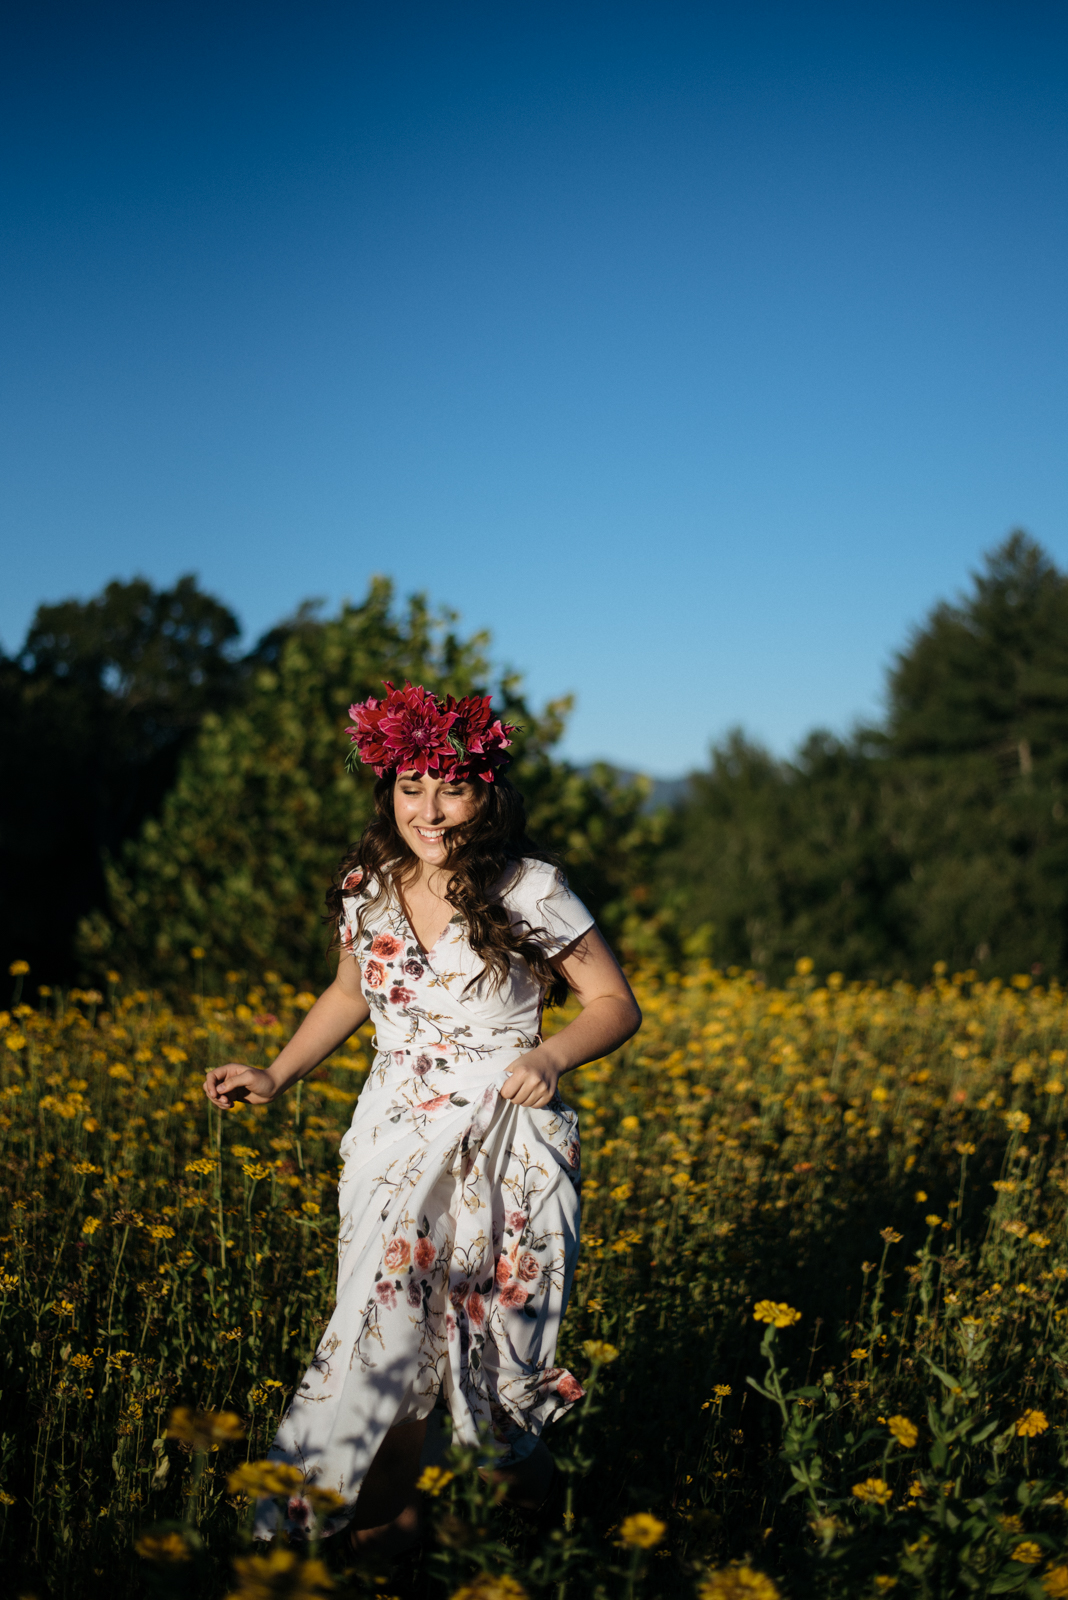 flower crown on girl running in field